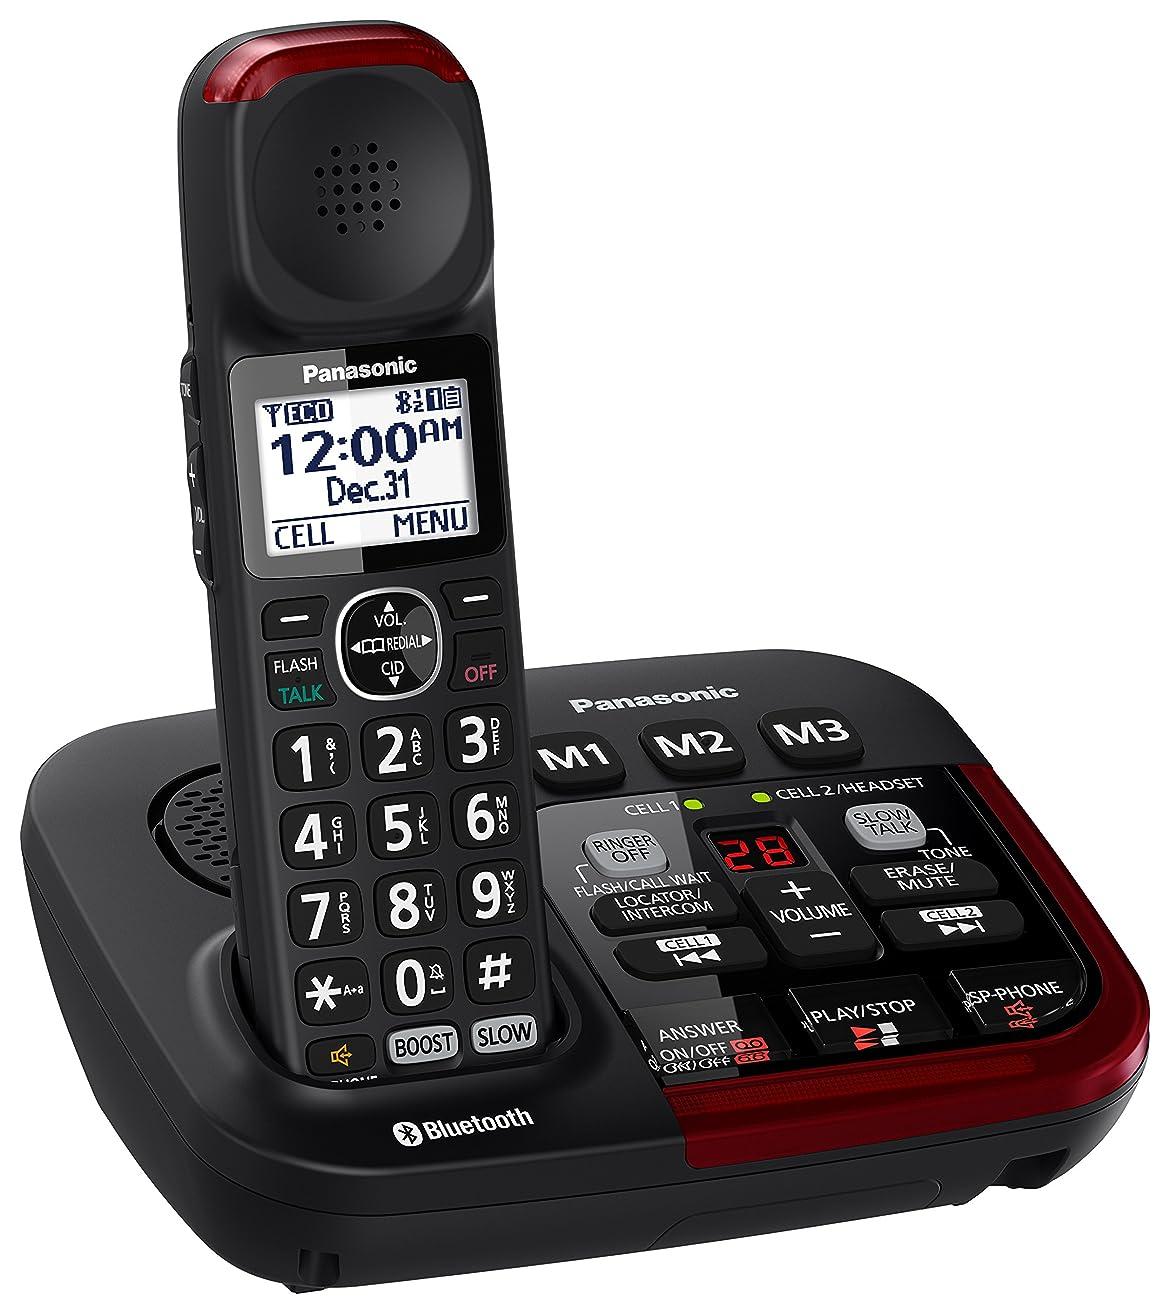 PANASONIC Link2Cell Bluetooth Cordless Phone with Answering Machine KX-TGM430B - 1 Handset (Black)